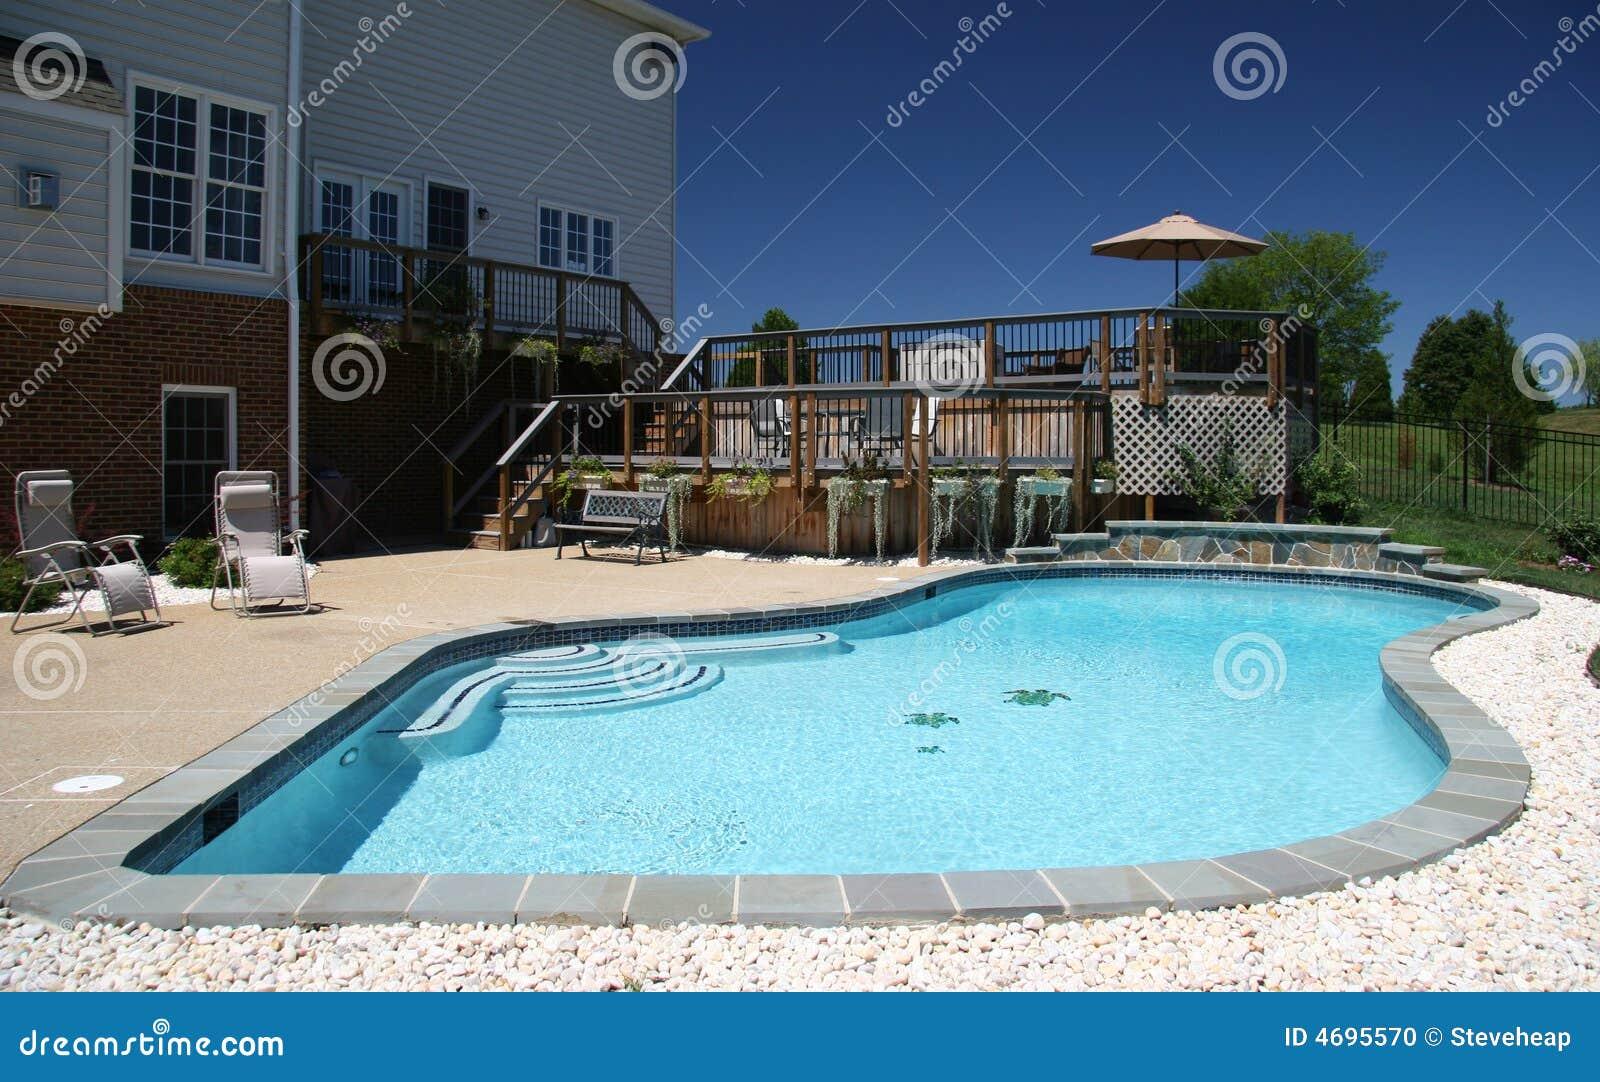 Garden pool in suburbs stock photo image of housing for Garden treasures pool clock